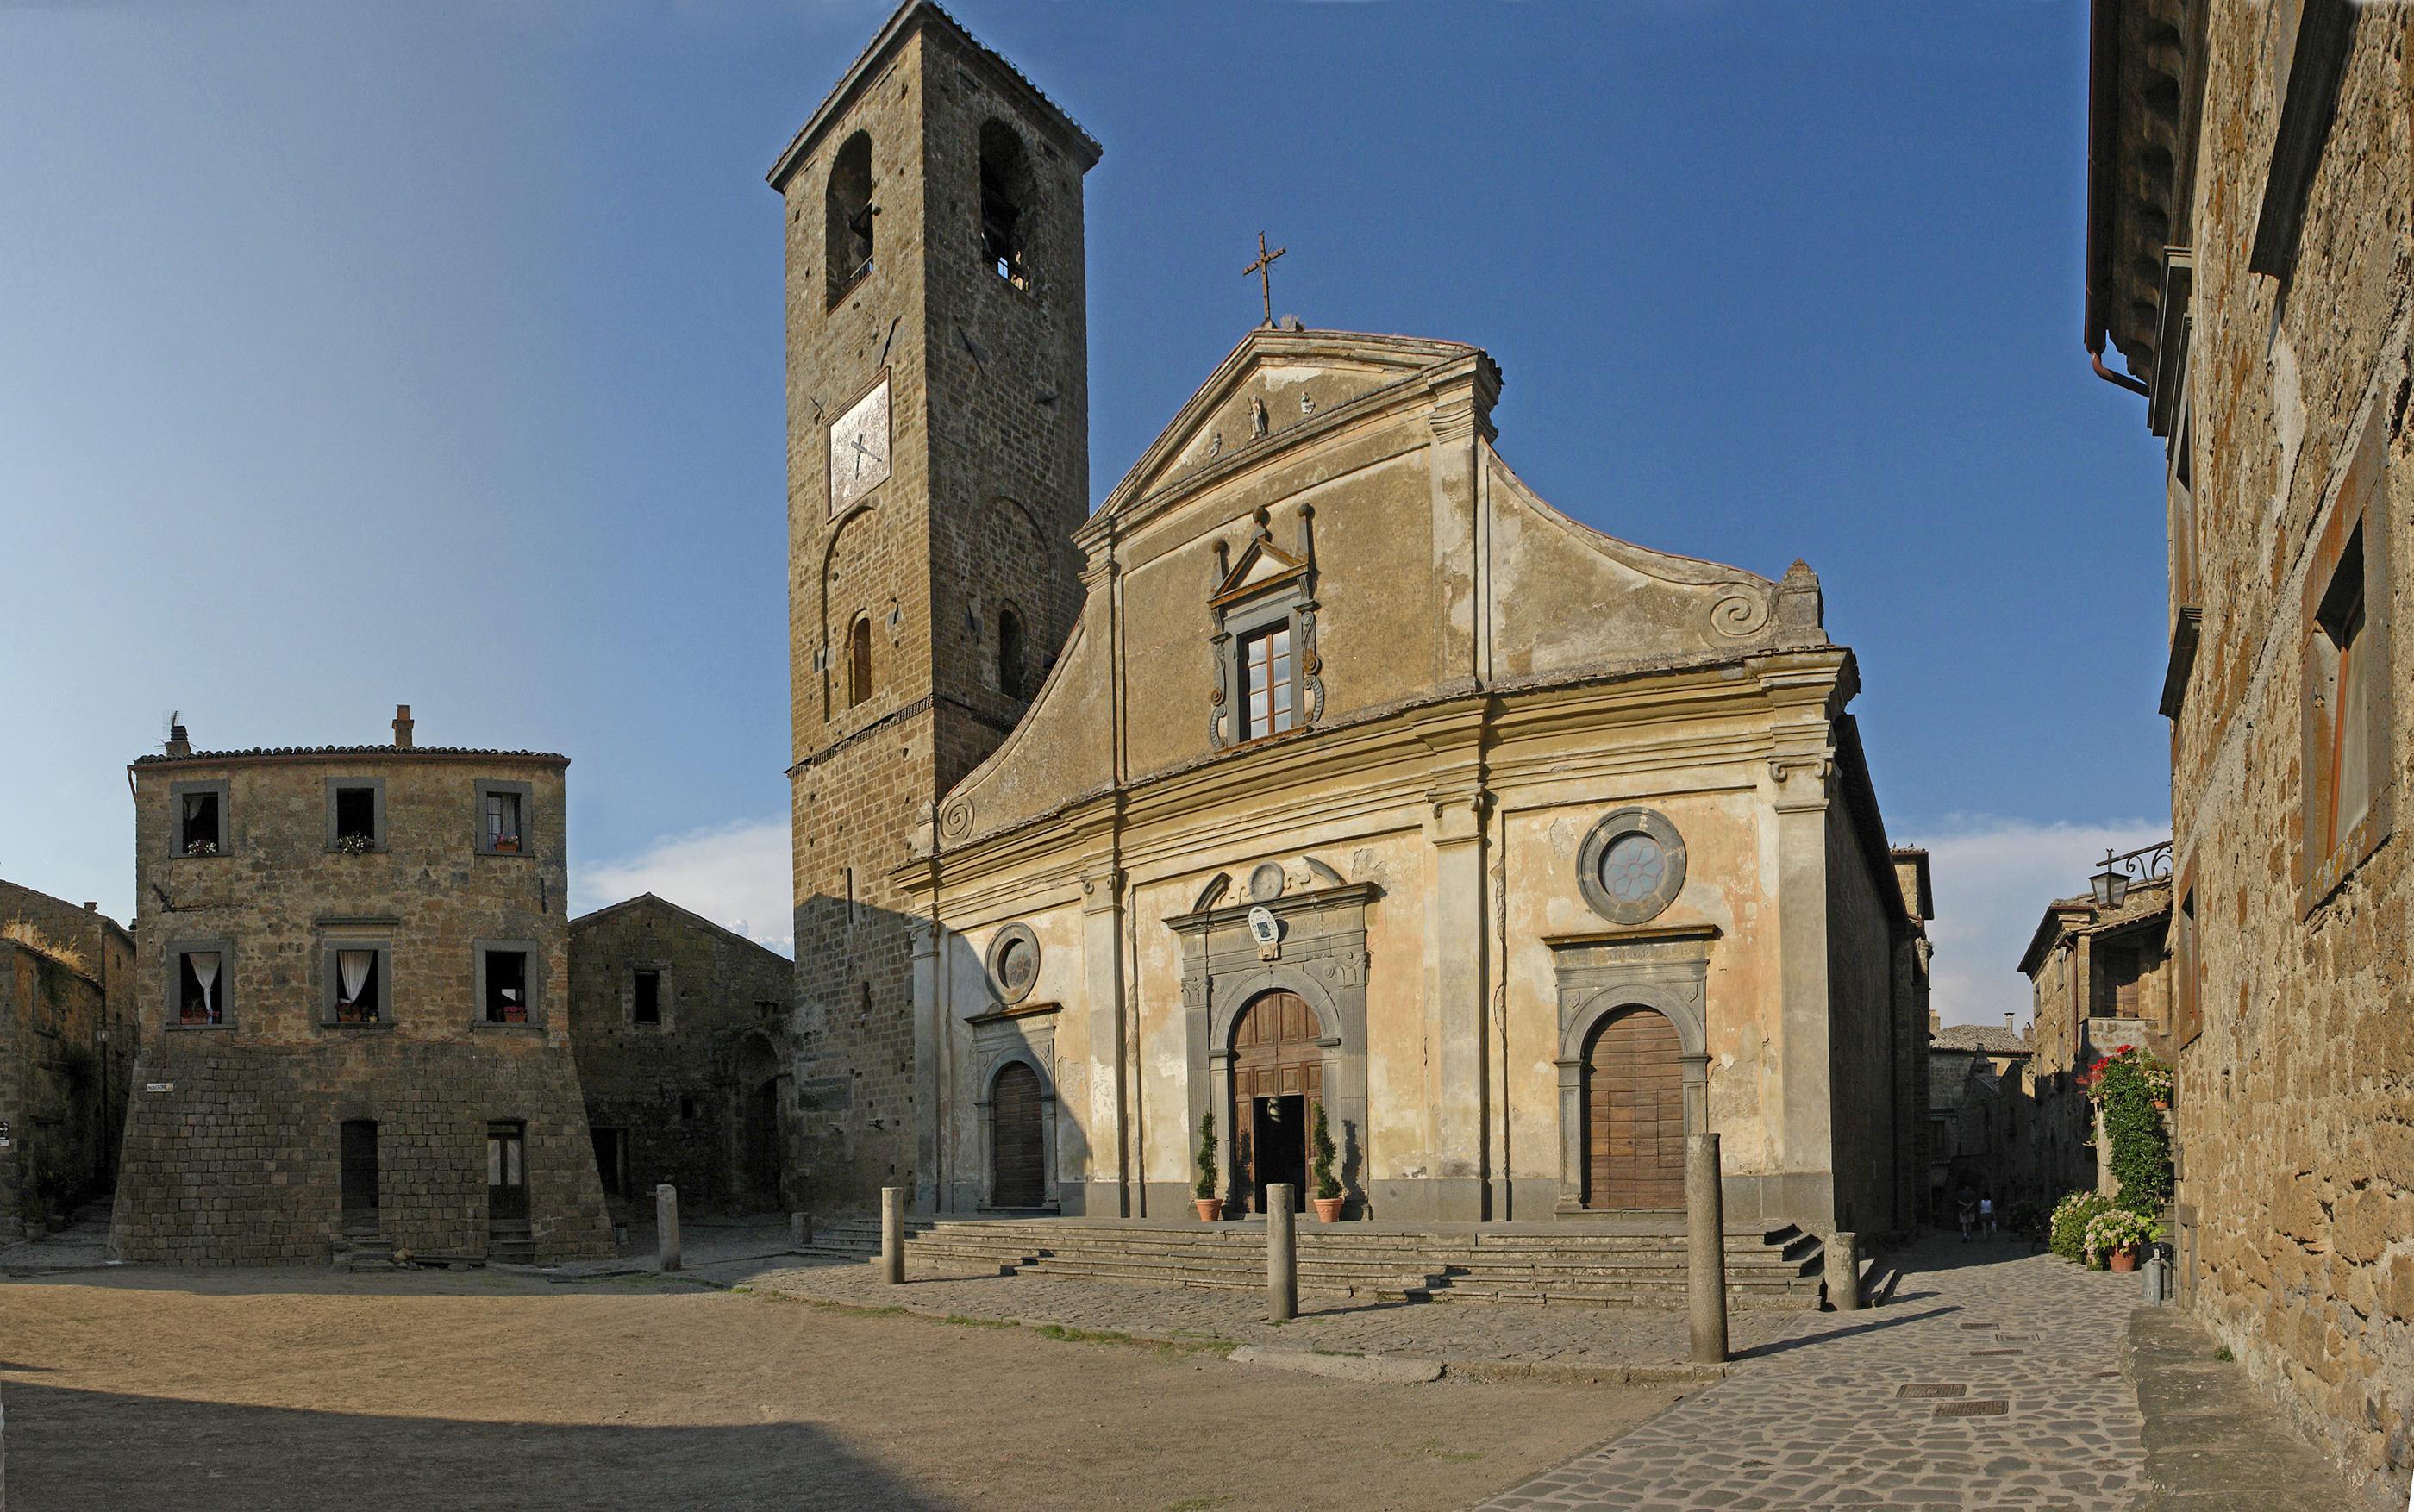 File:Bagnoreggio kirchplatz.jpg - Wikimedia Commons